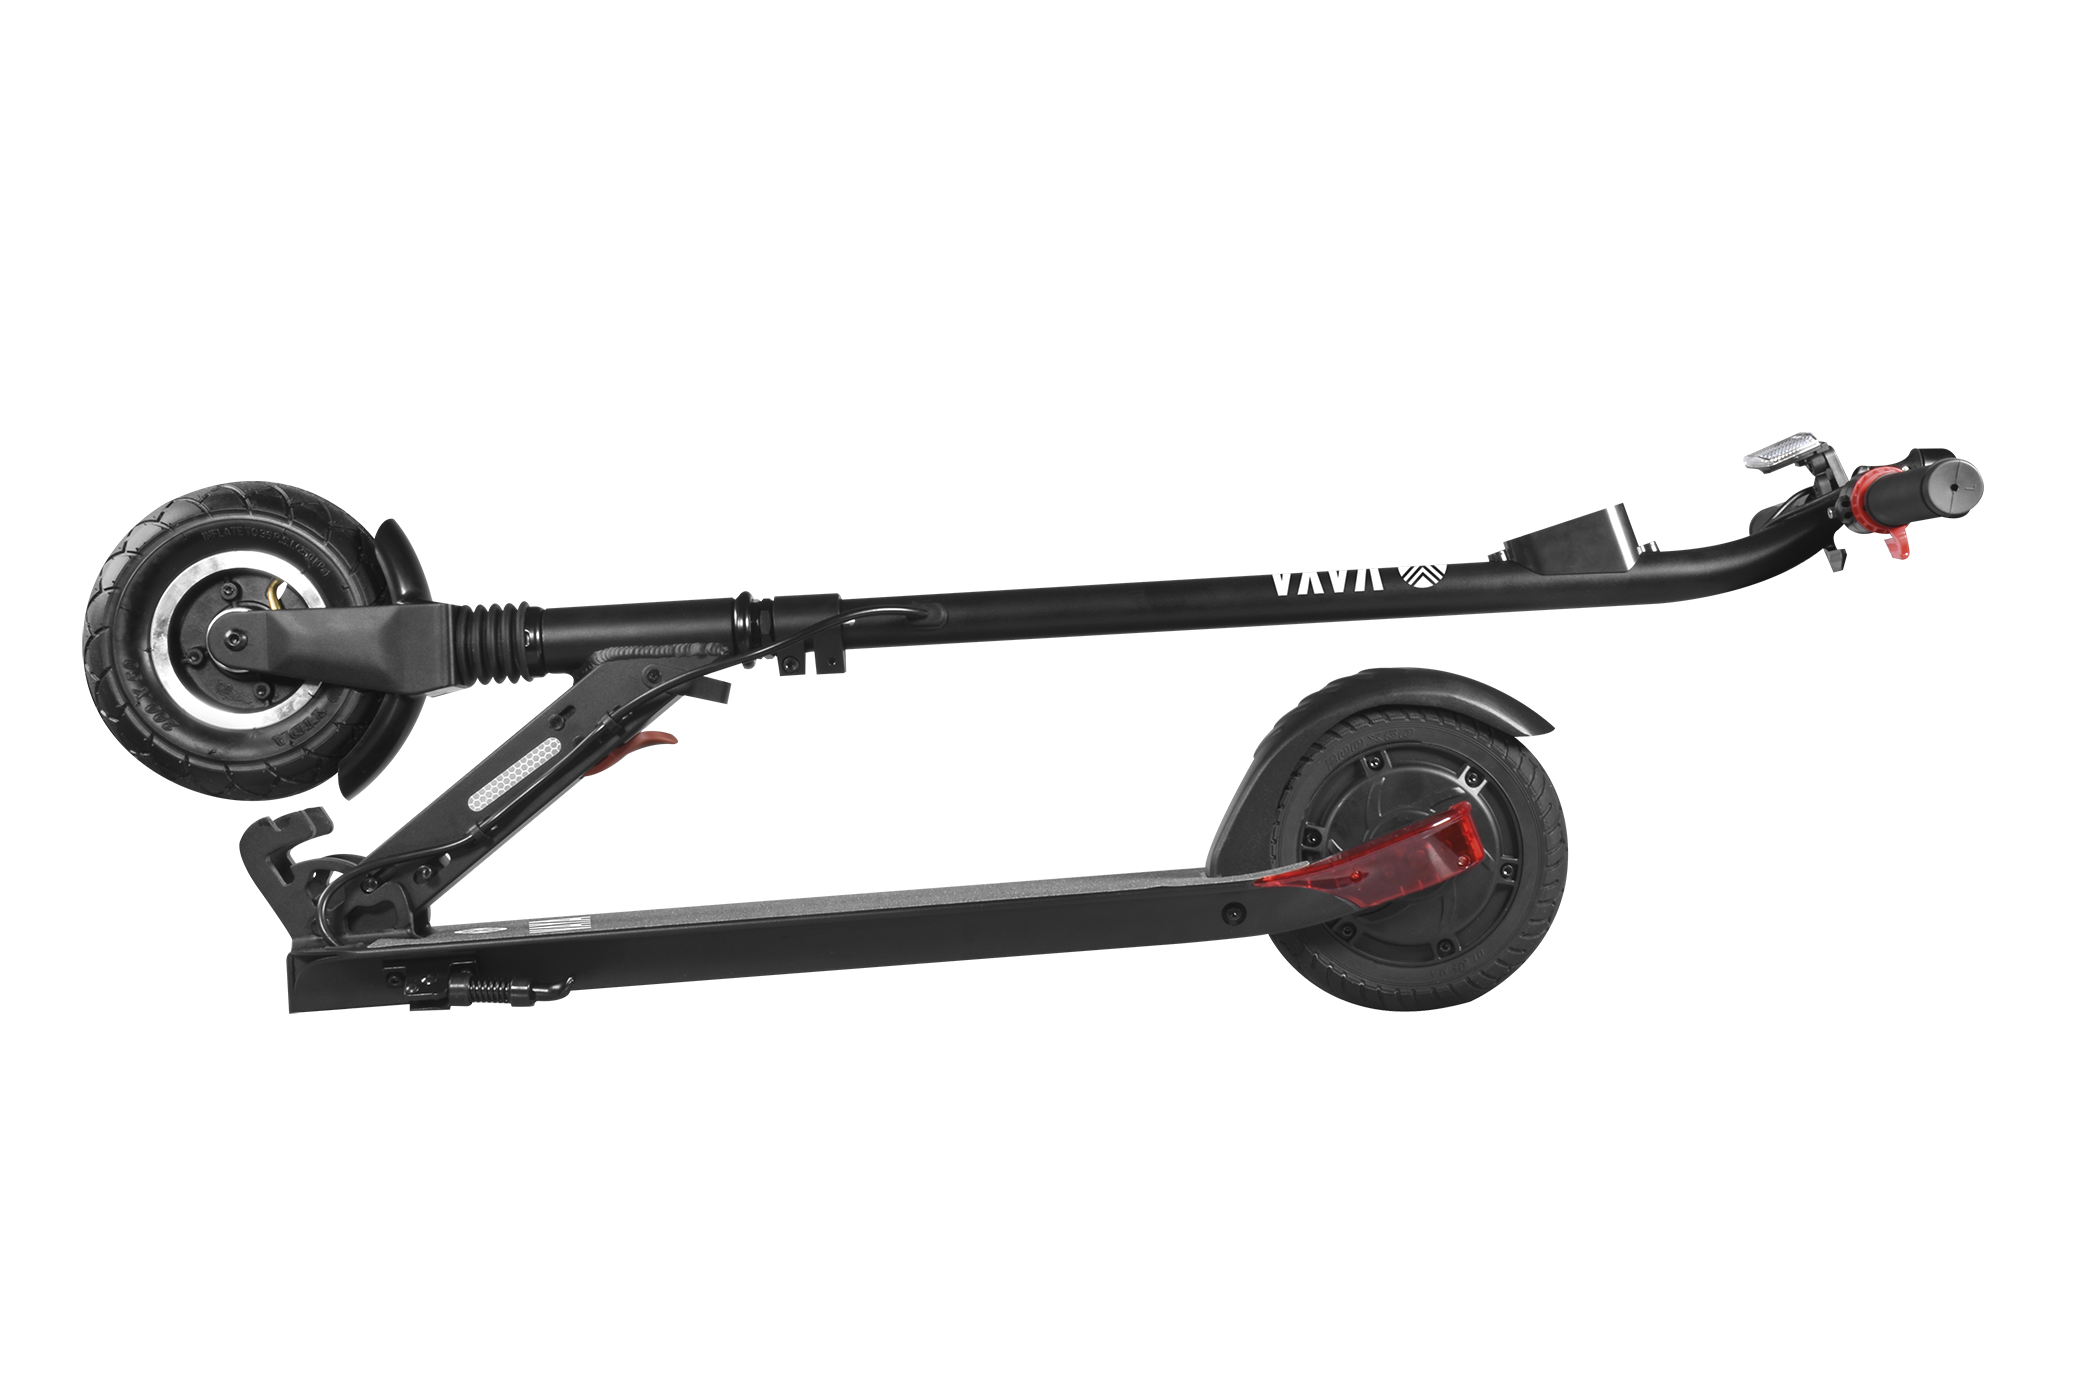 1601 - El Løbehjul - Foldet